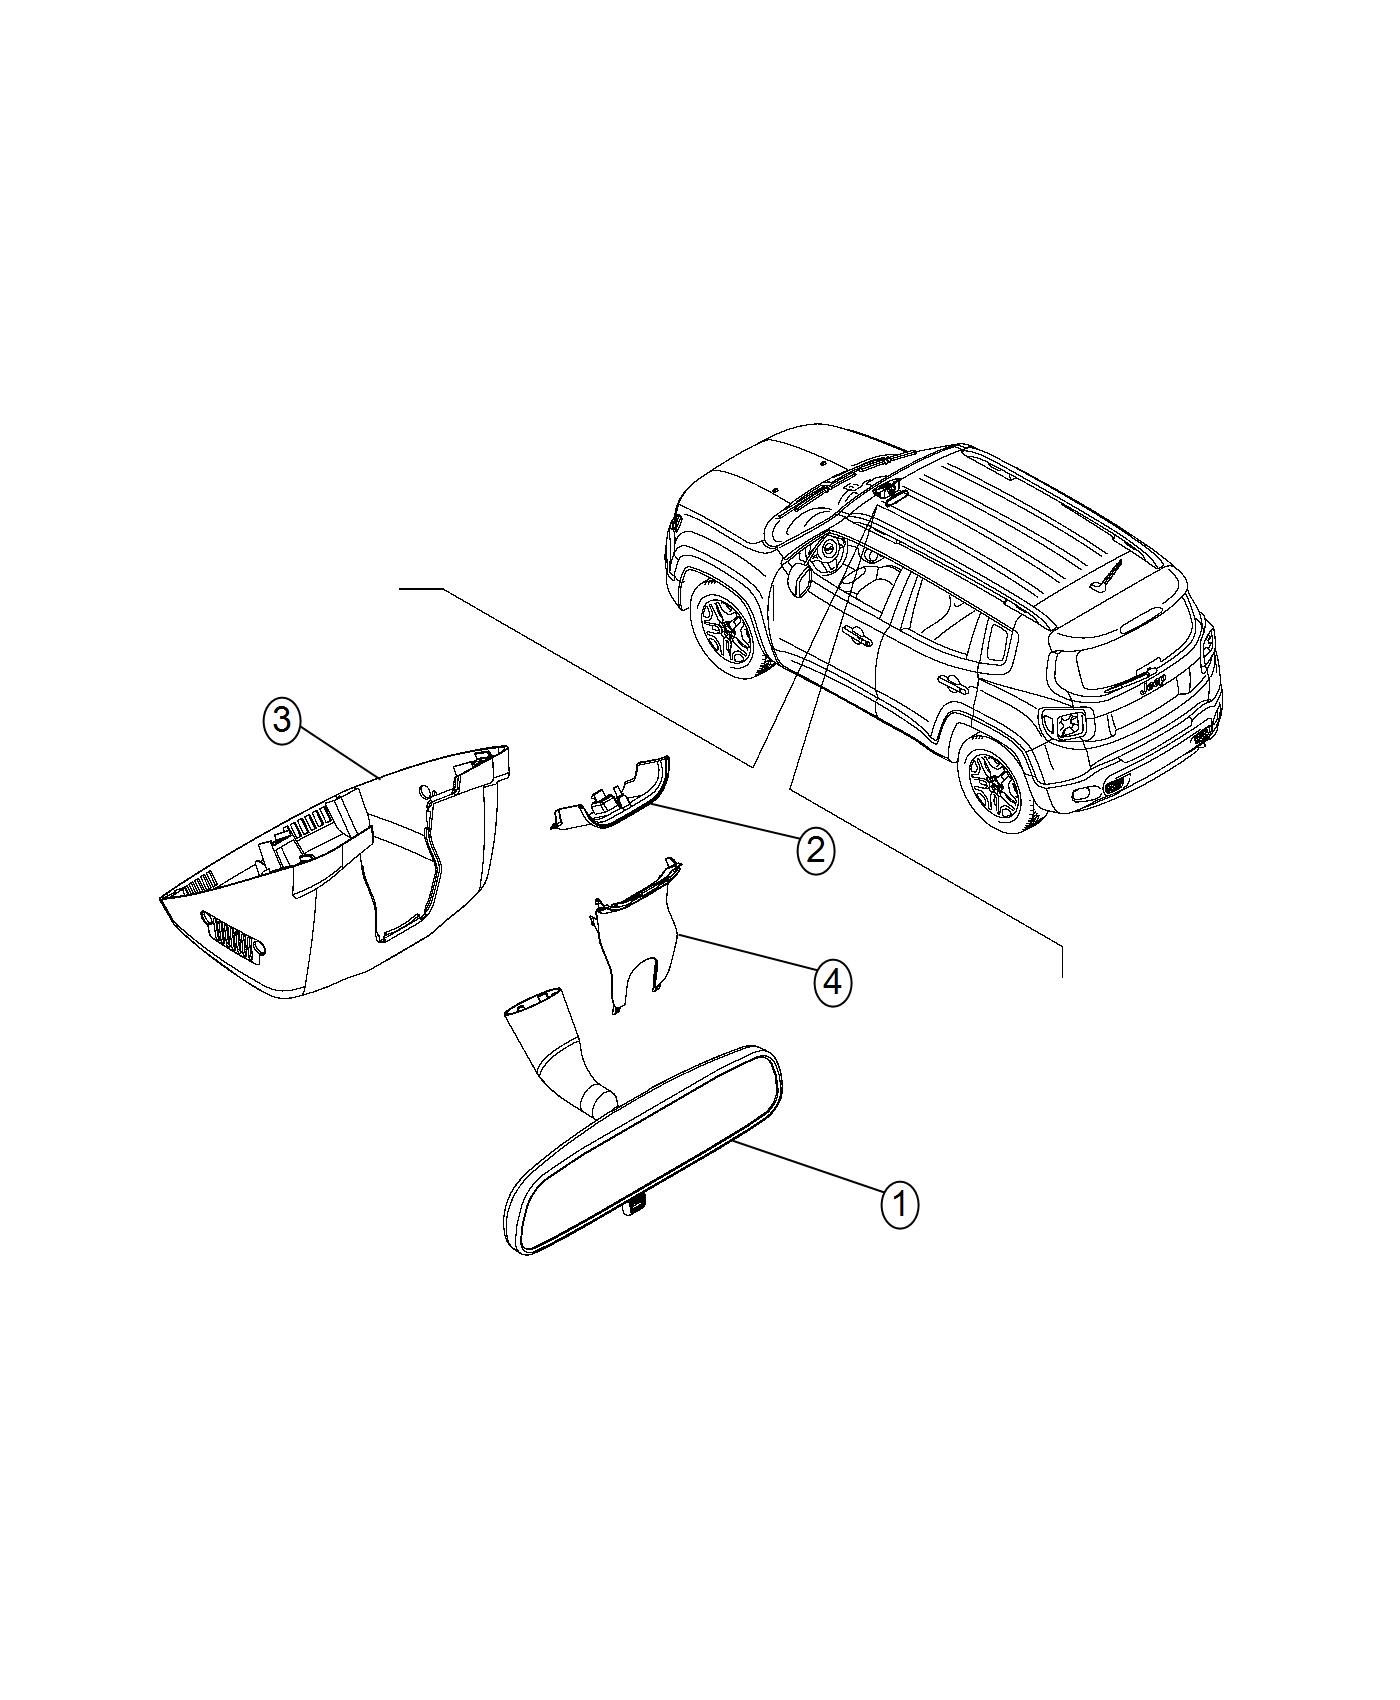 Jeep Renegade Mirror Inside Rear View Export Trim No